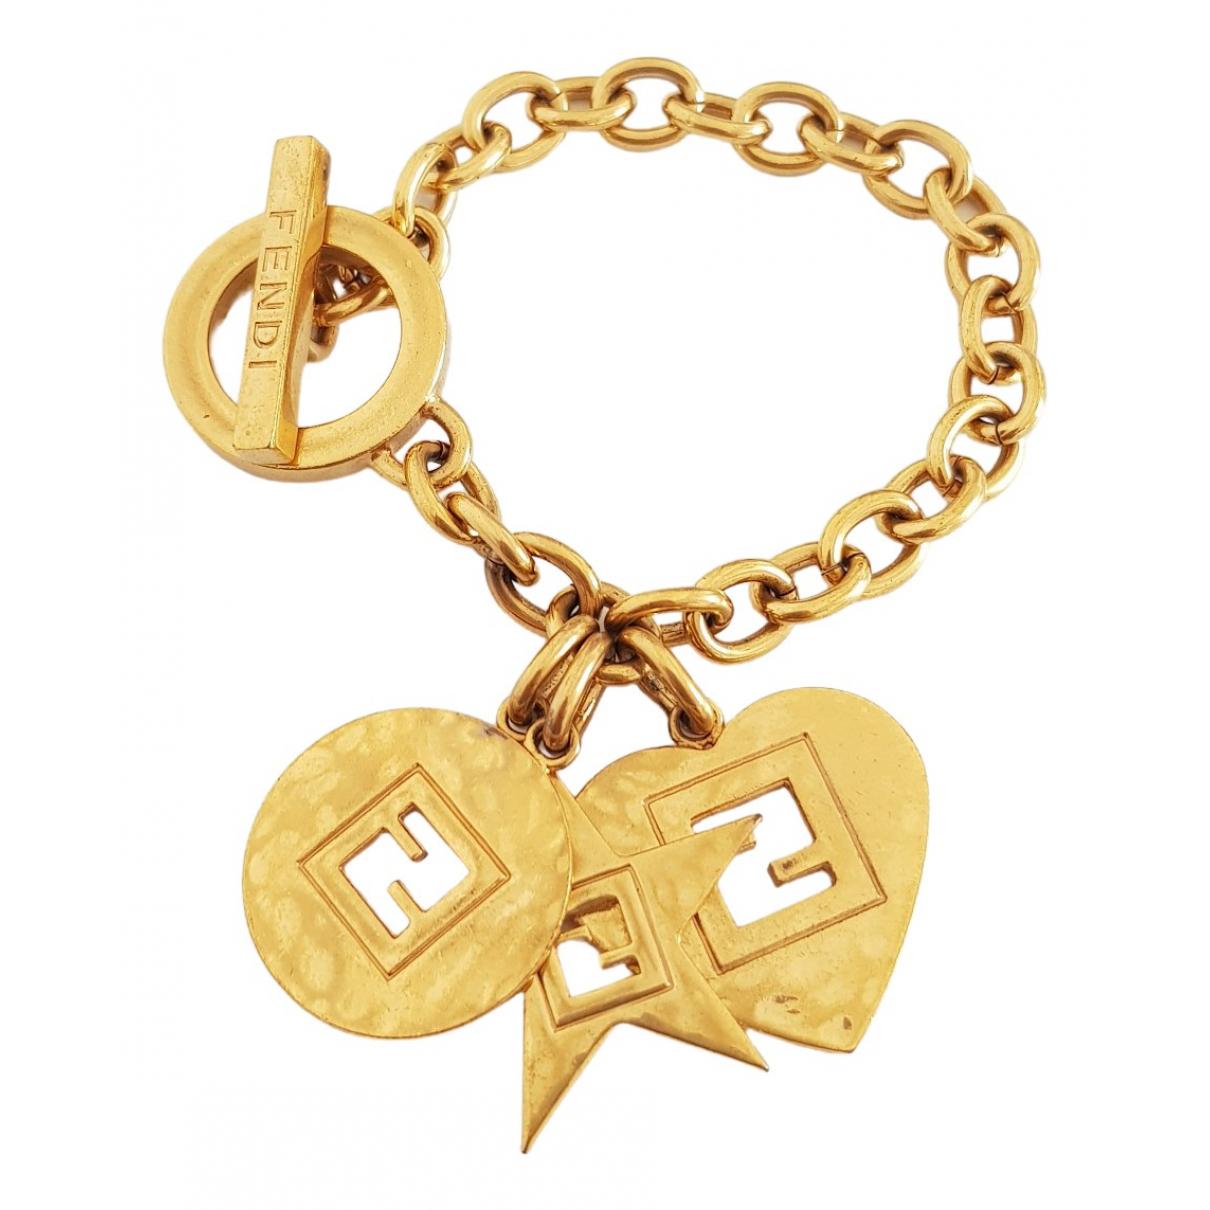 Fendi \N Gold Metal bracelet for Women \N